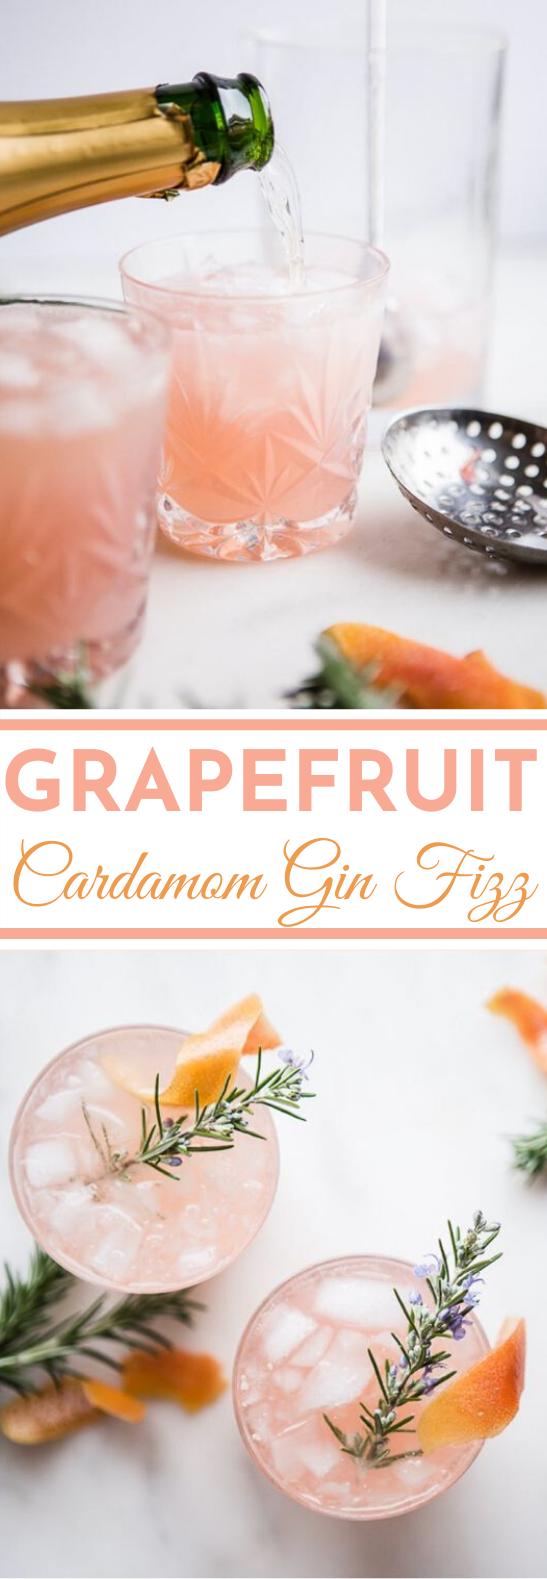 Grapefruit Cardamom Gin Fizz #alcohol #drinks #cocktails #gin #beverages